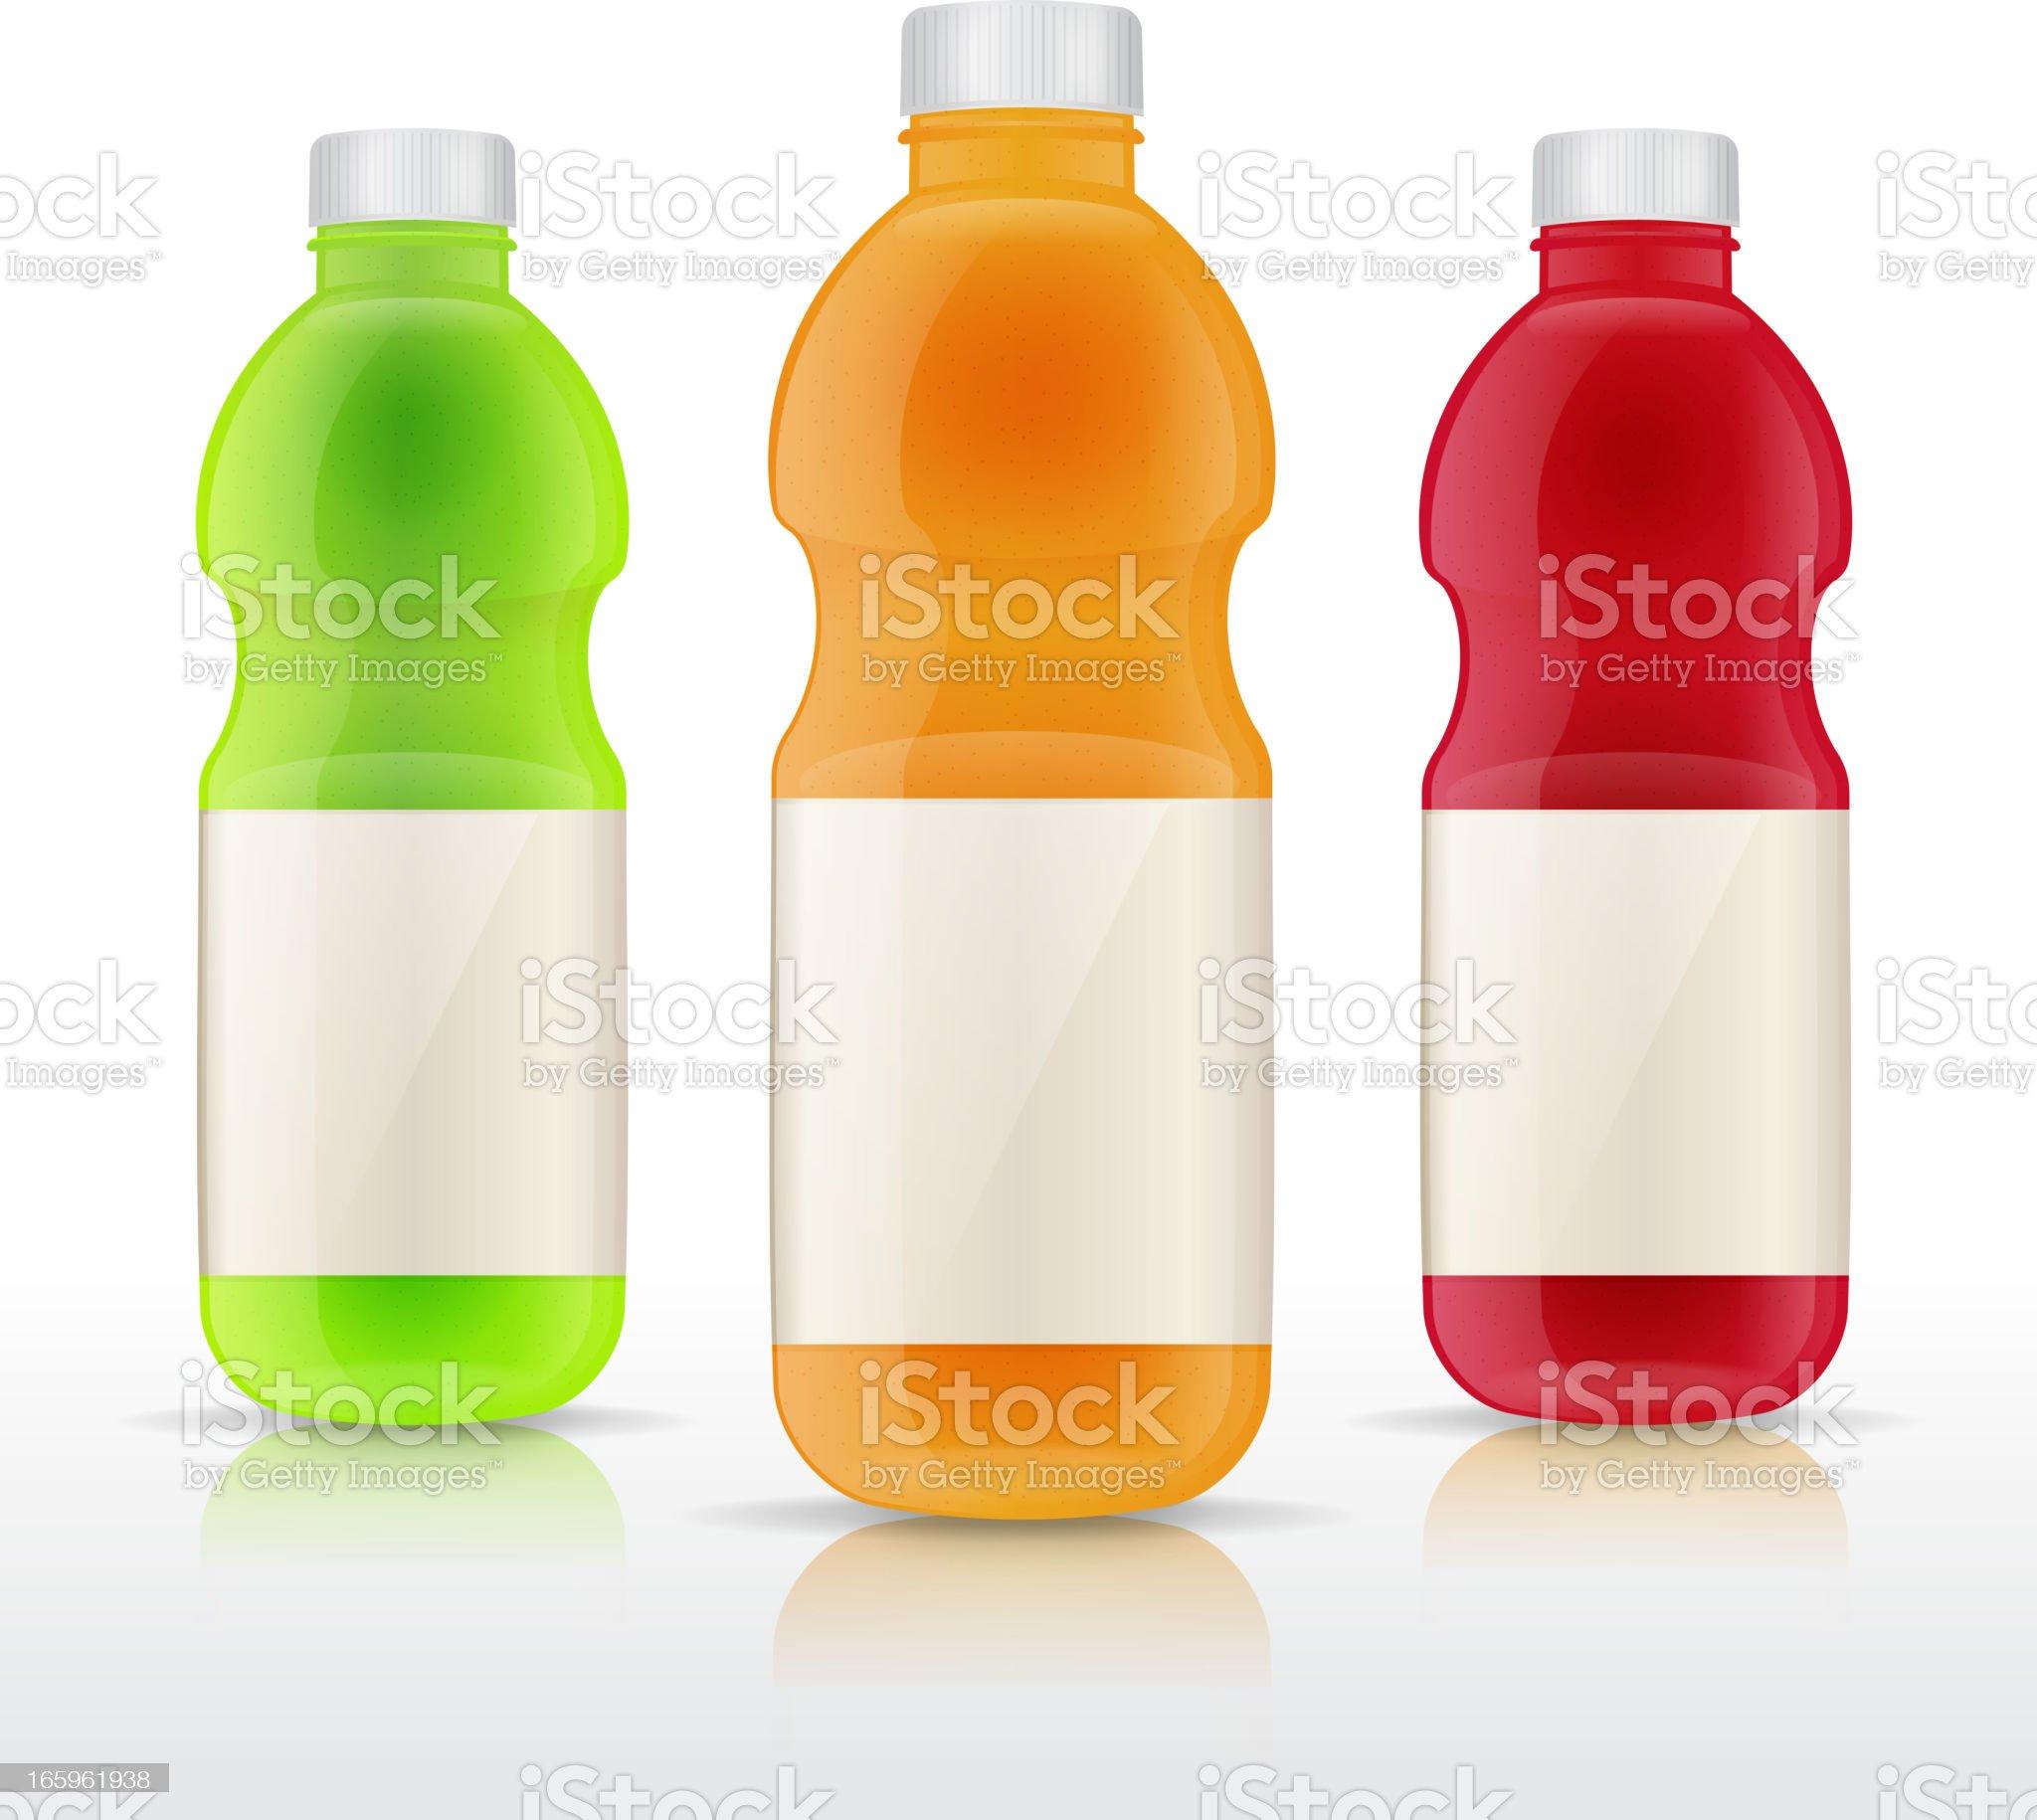 Juice bottles royalty-free stock vector art